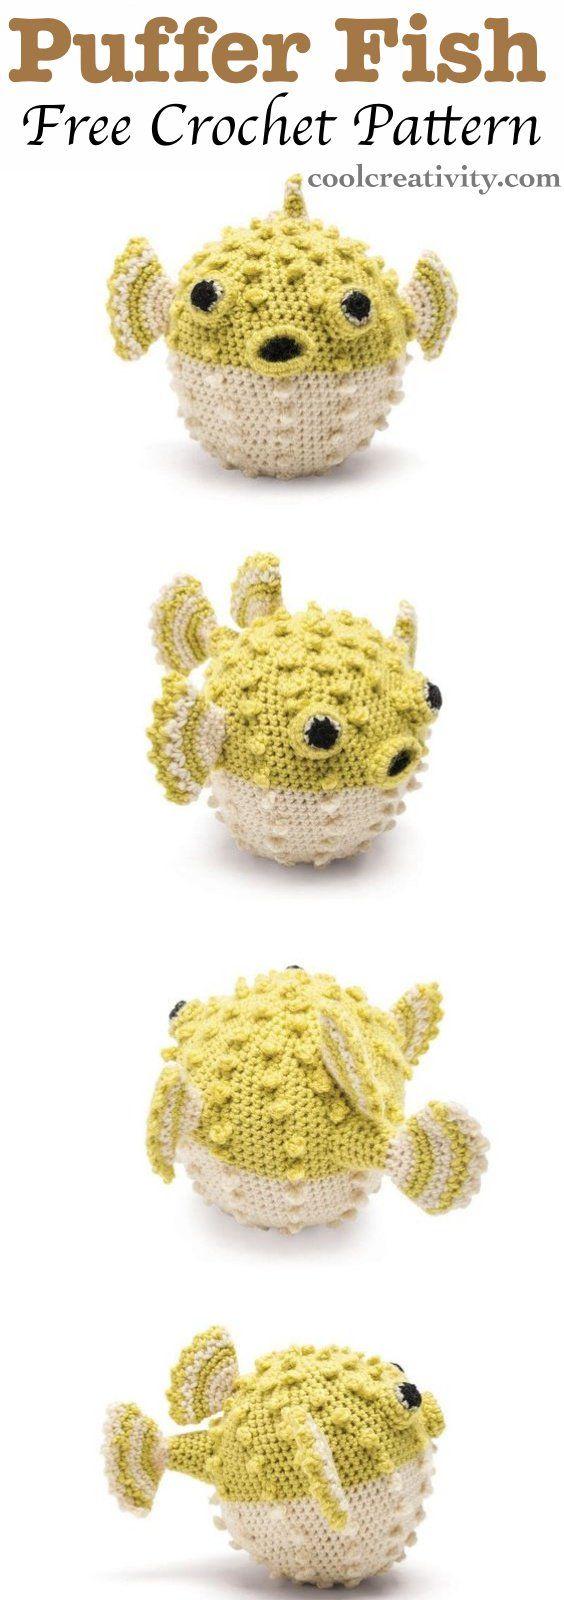 Crochet Cute Amigurumi Puffer Fish with Free Pattern